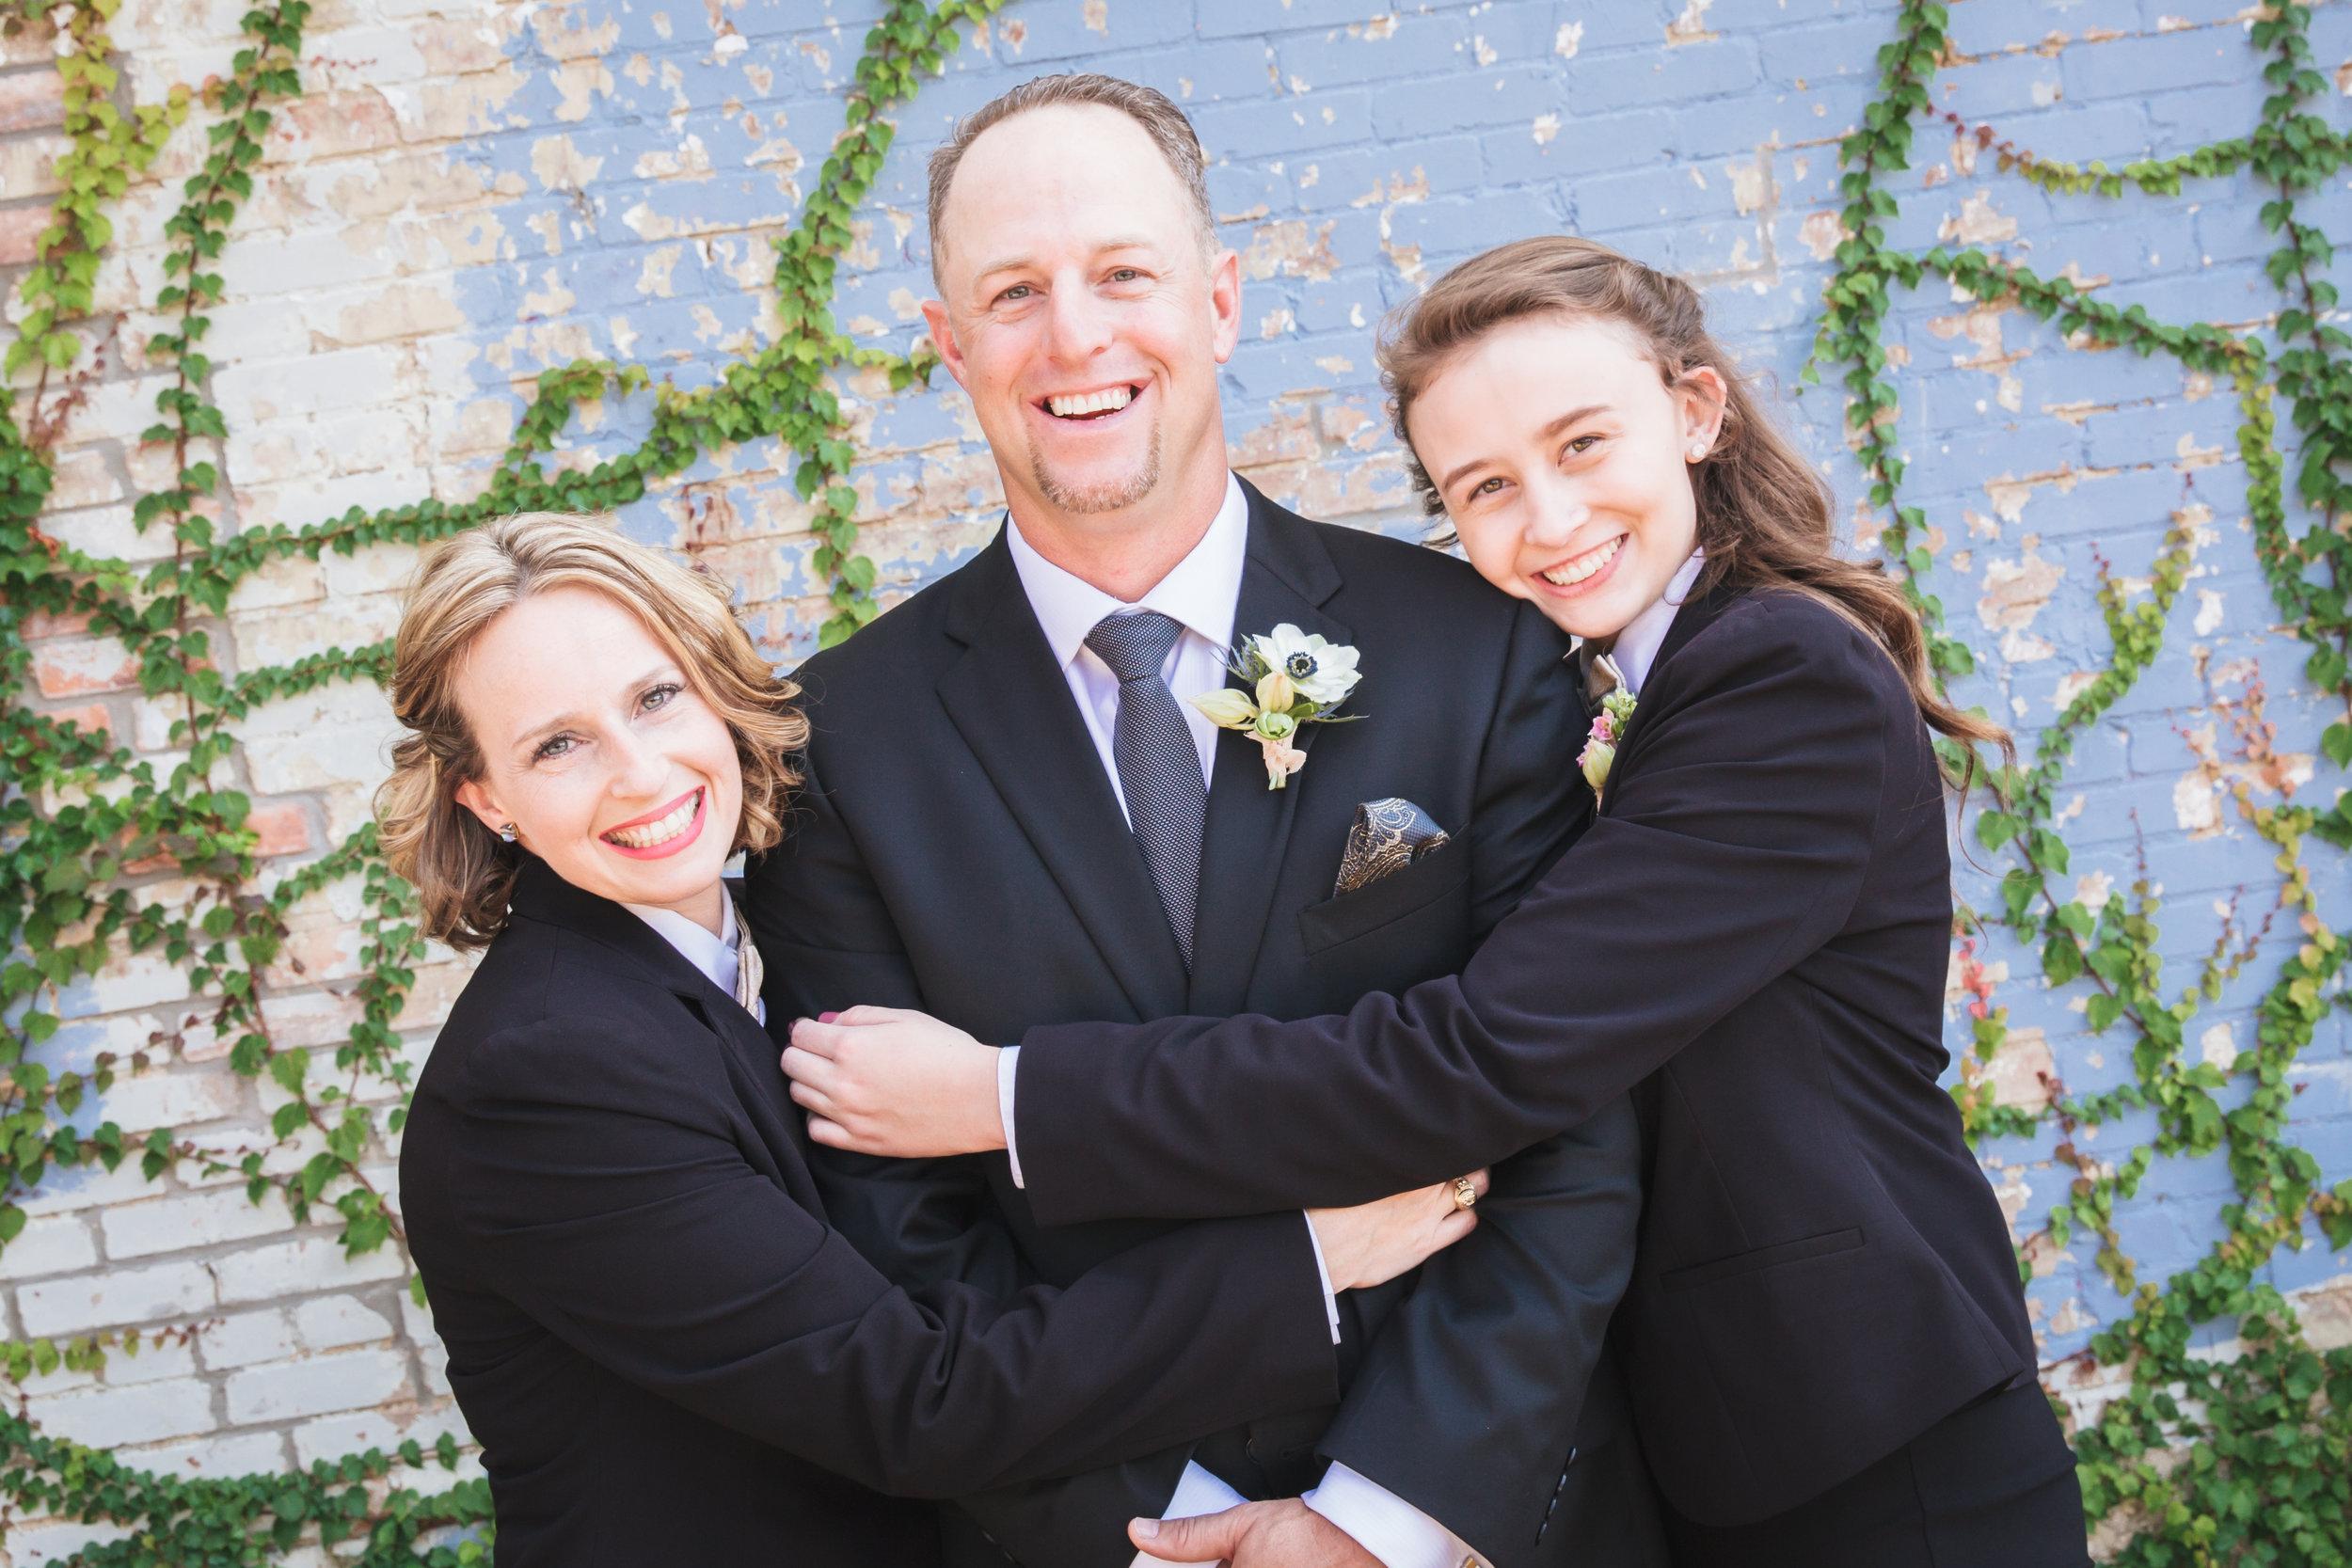 Fort_Worth_Brik__WeddingVenue_Wedding.jpg